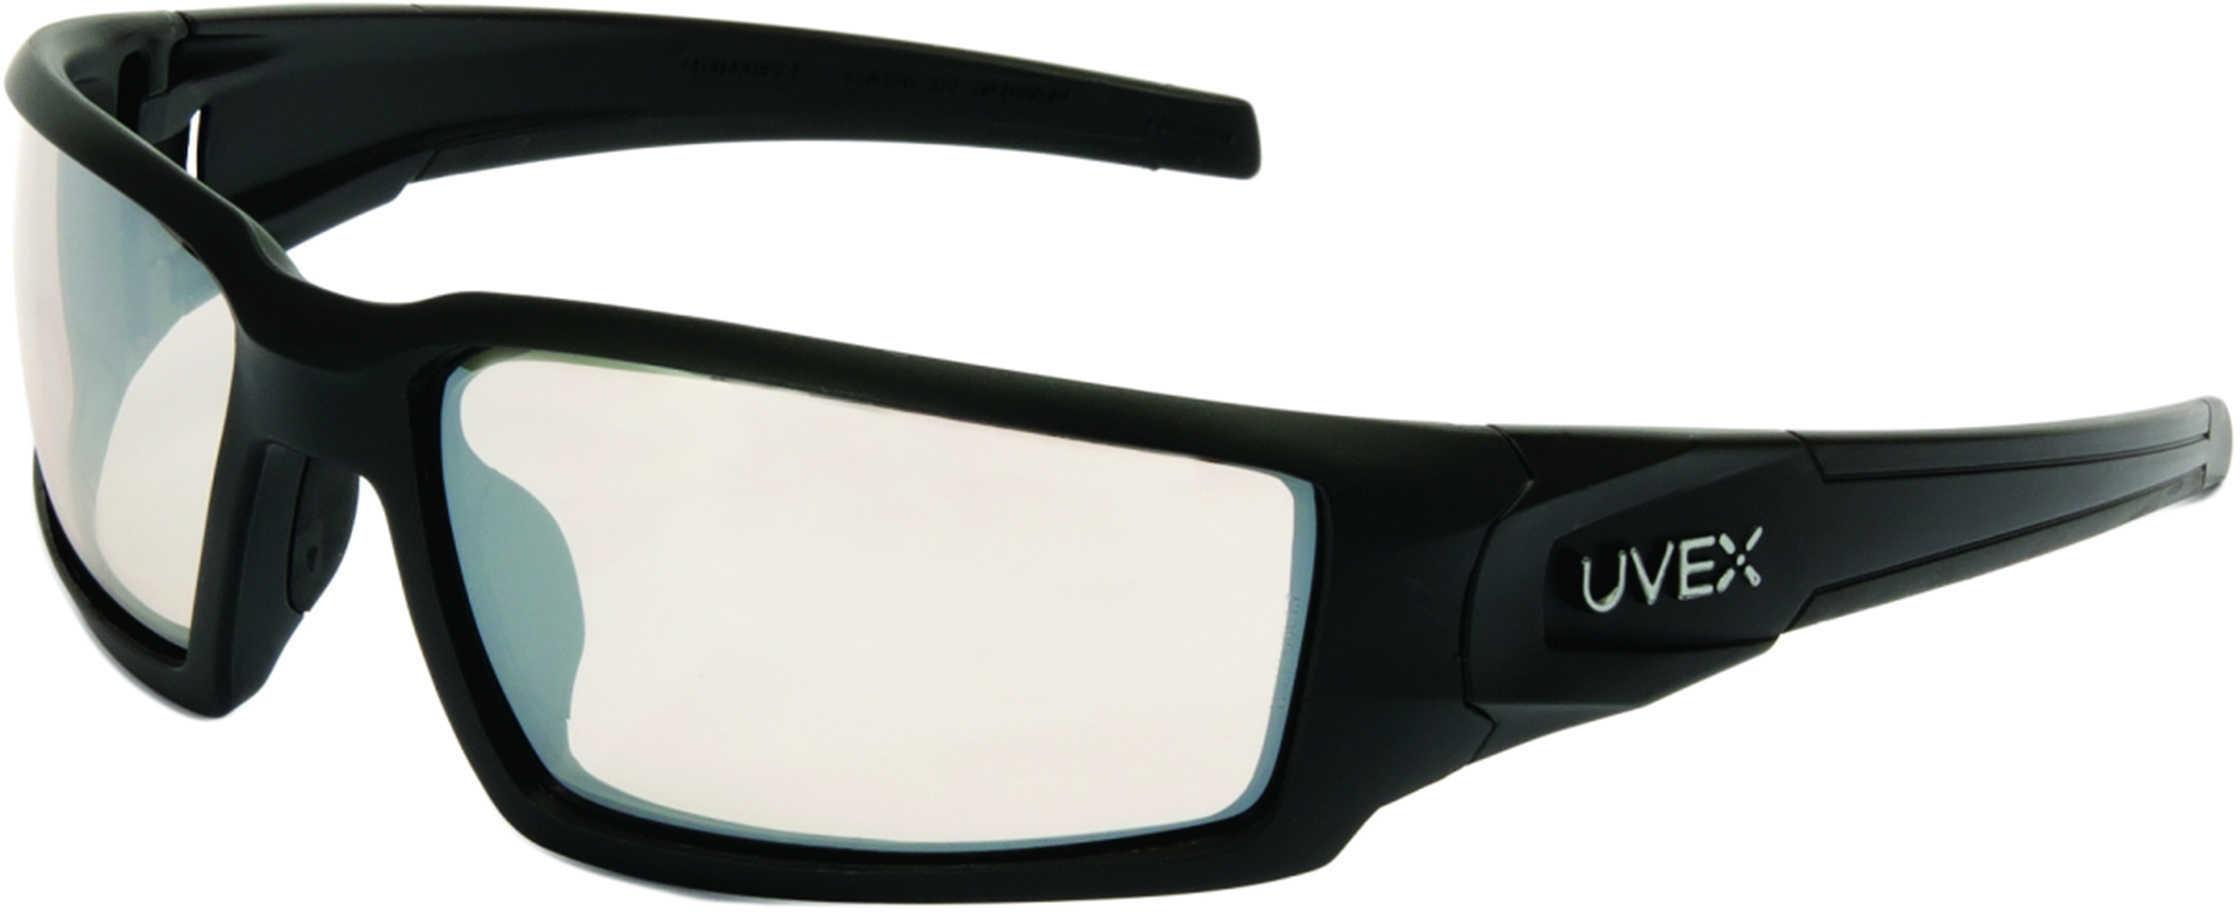 Howard Leight Hypershock Glasses SCT-Reflect 50 Lens, Hardcoat Md: R-02222